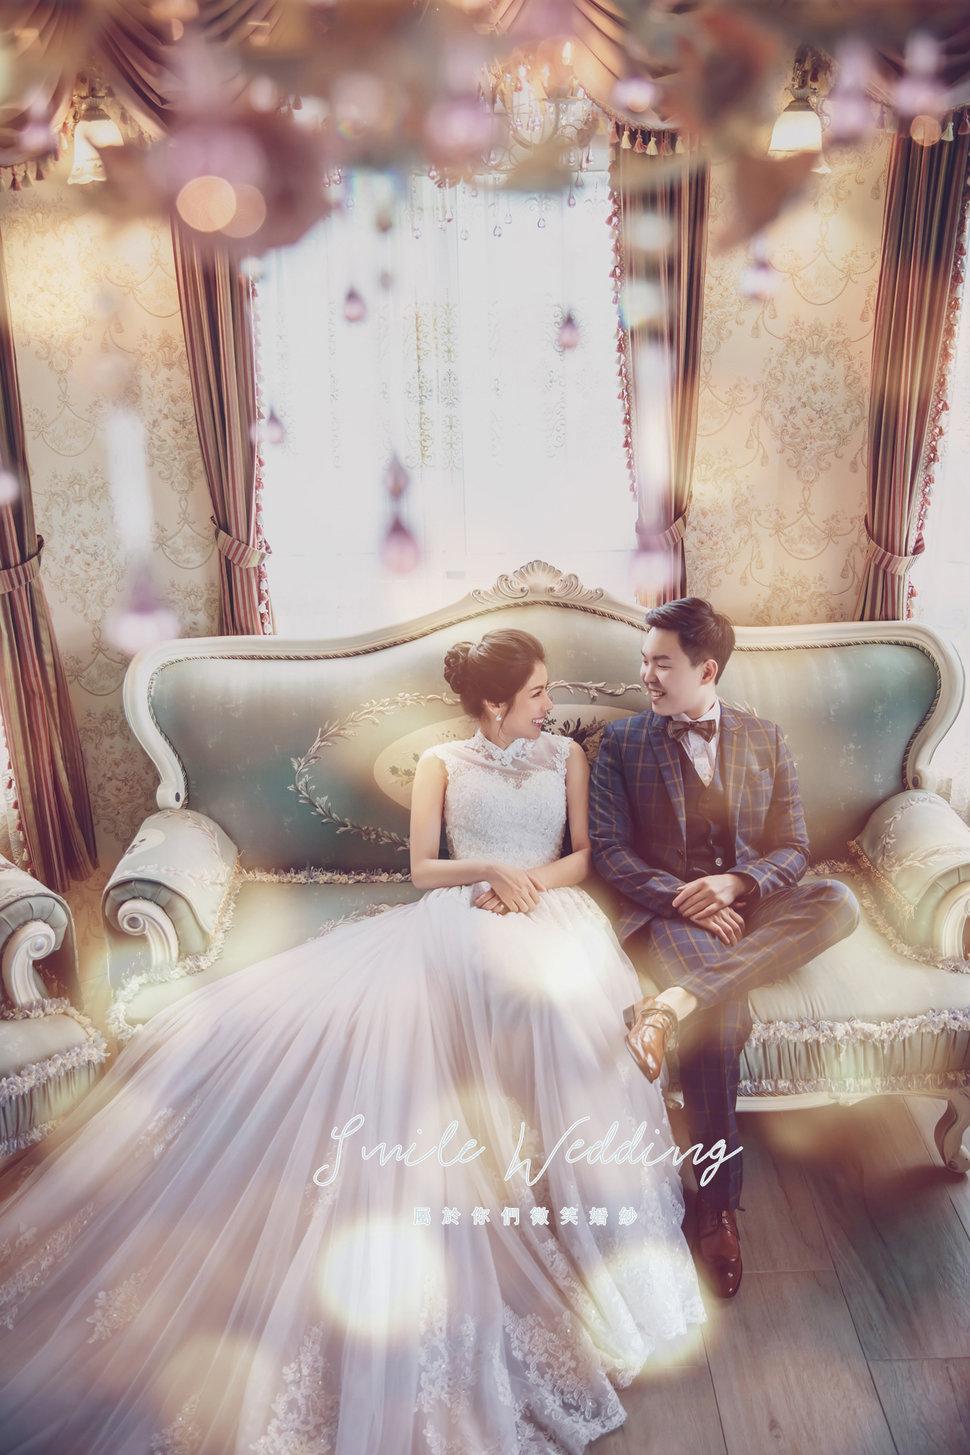 SIN_8477 - Smile wedding 微笑婚紗《結婚吧》